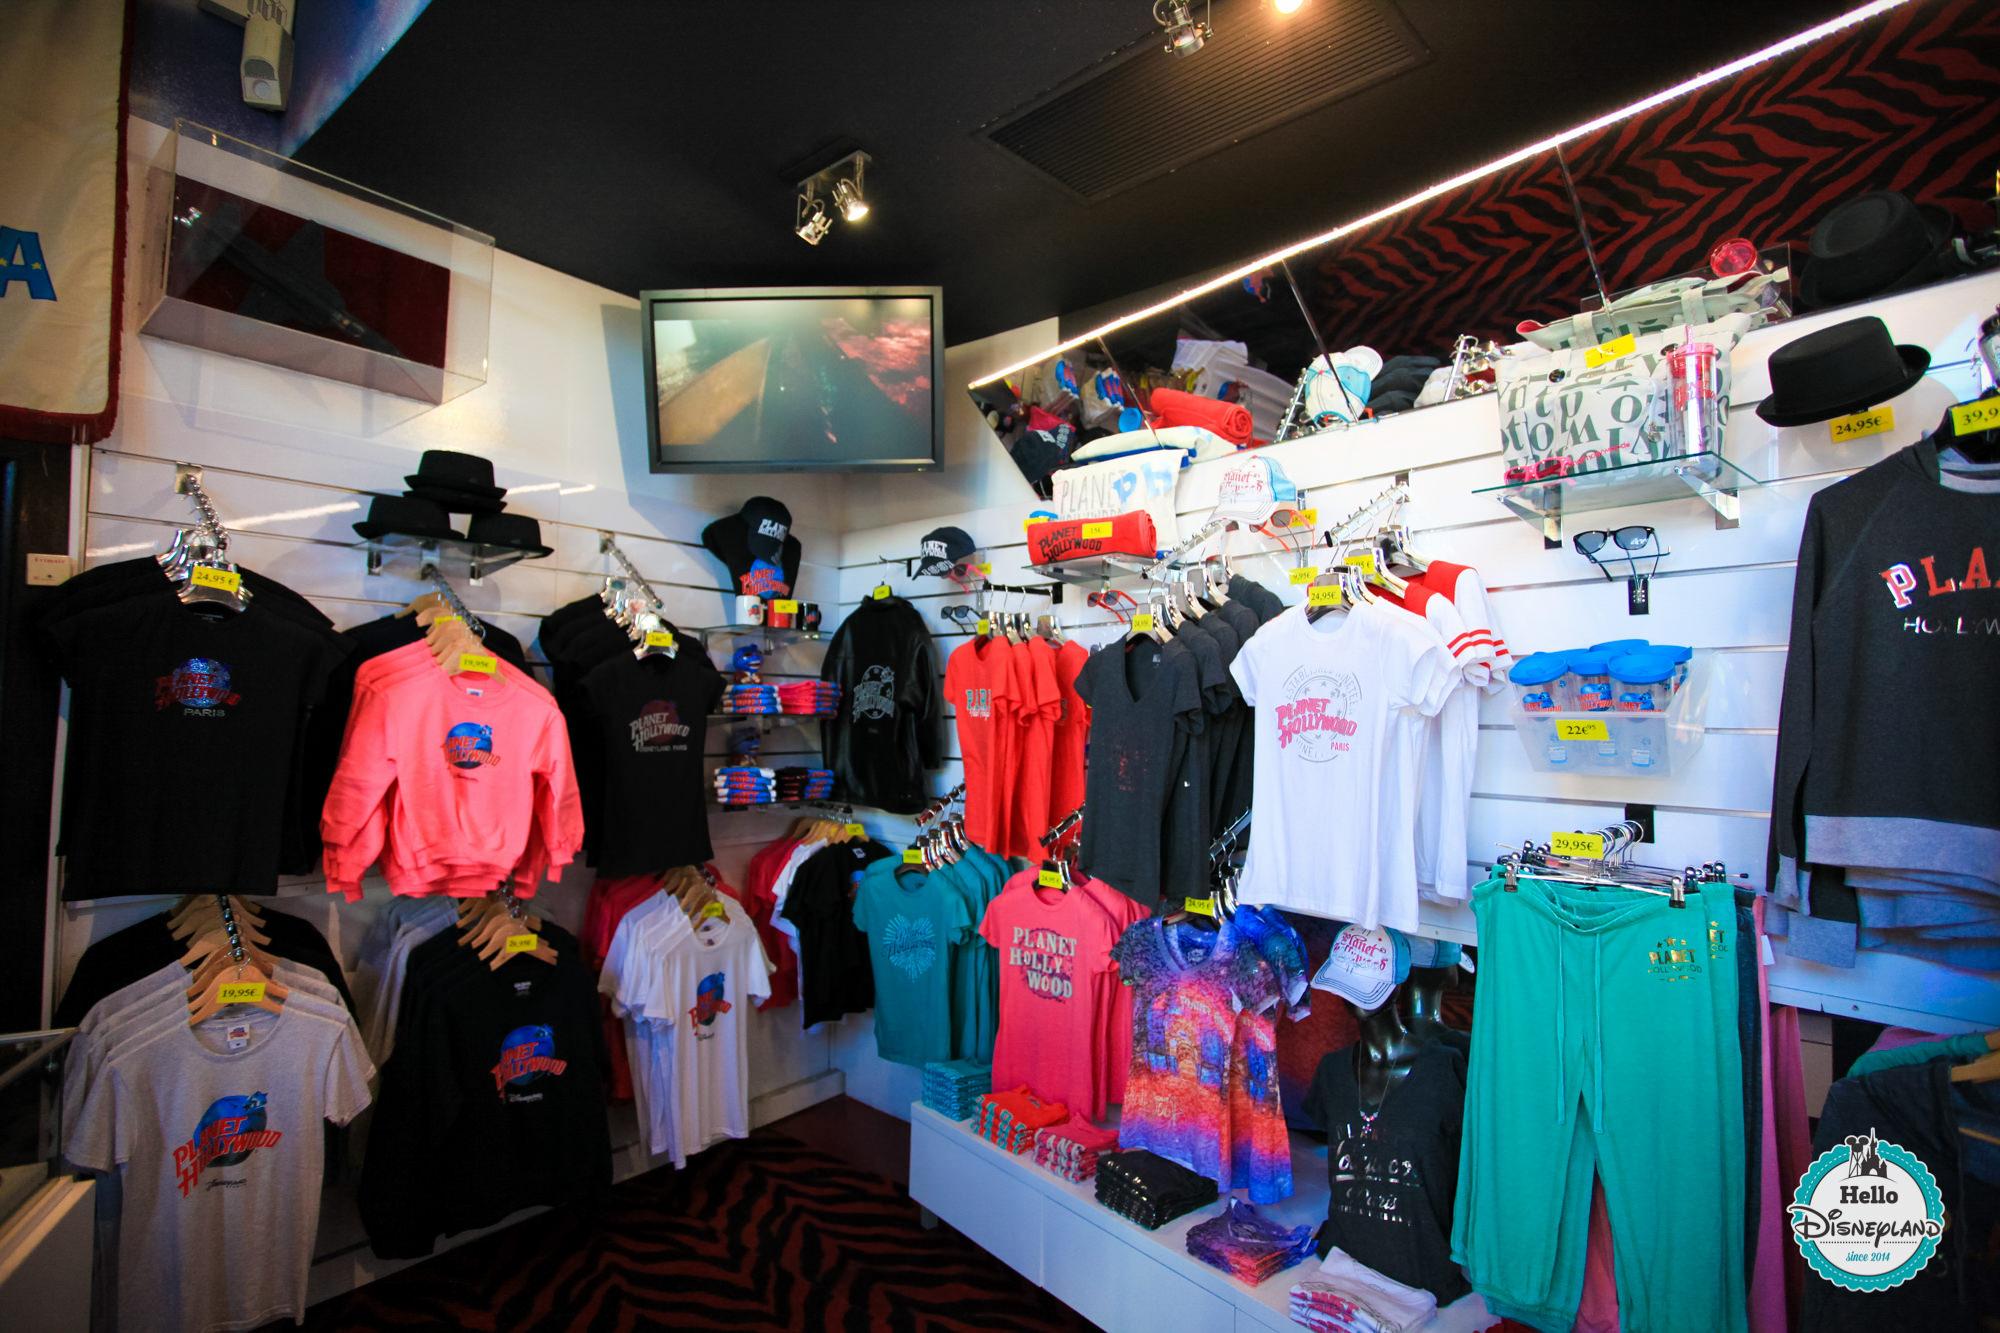 Hello Disneyland  Le blog n1 sur Disneyland Paris  Planet Hollywood Boutique